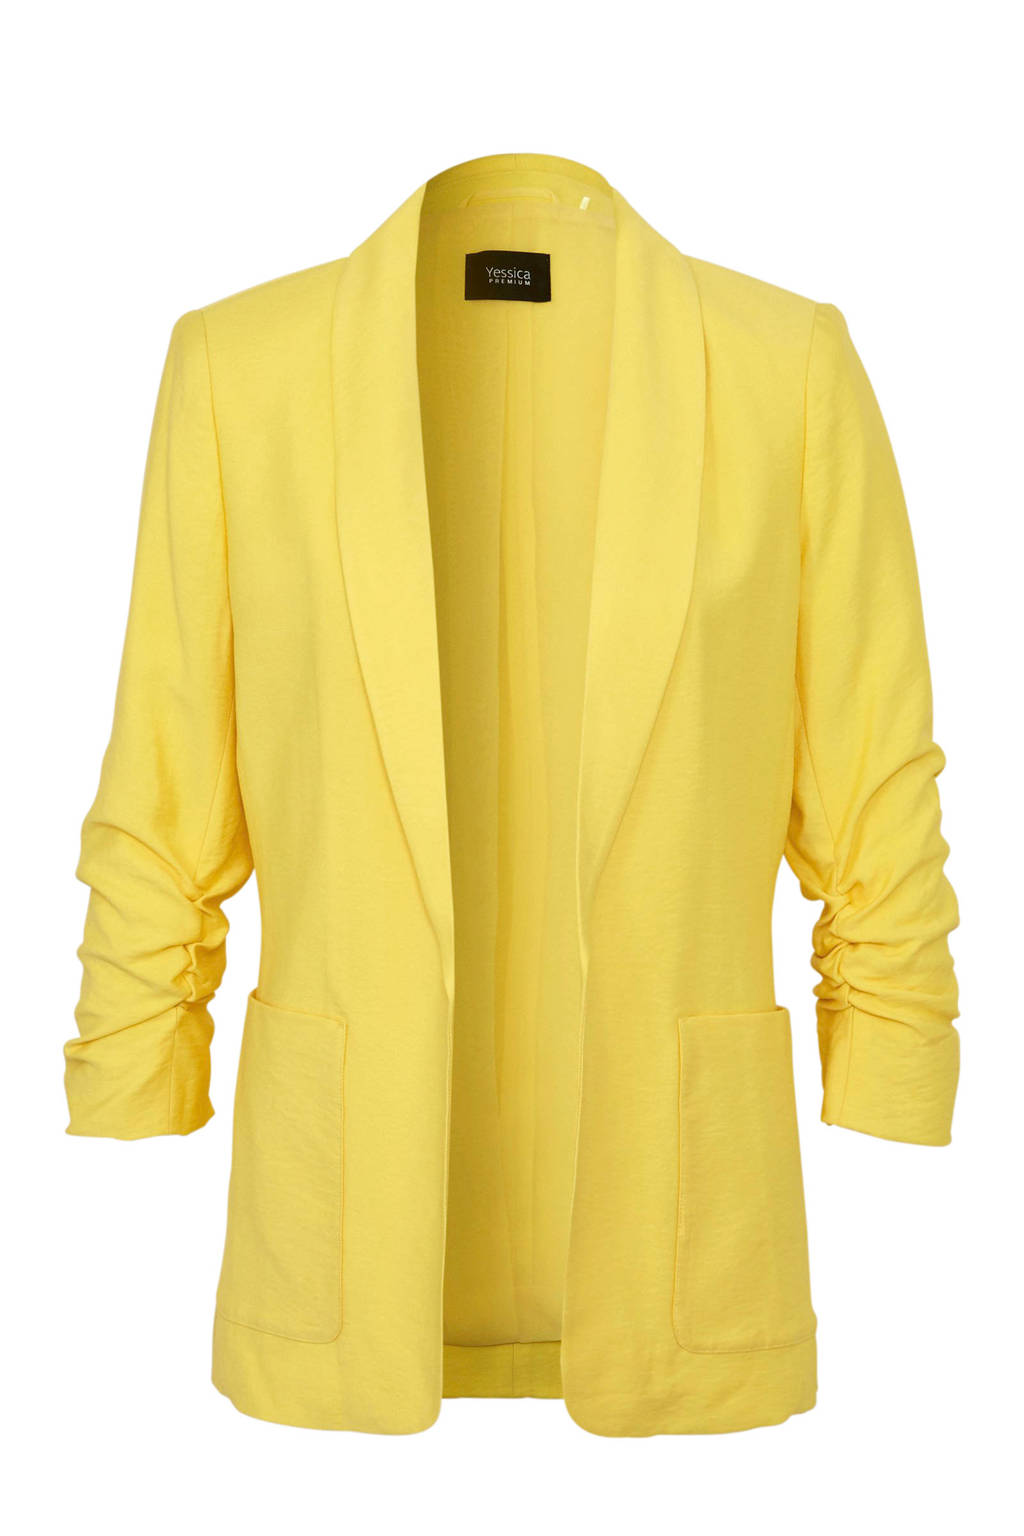 C&A blazer geel, Geel